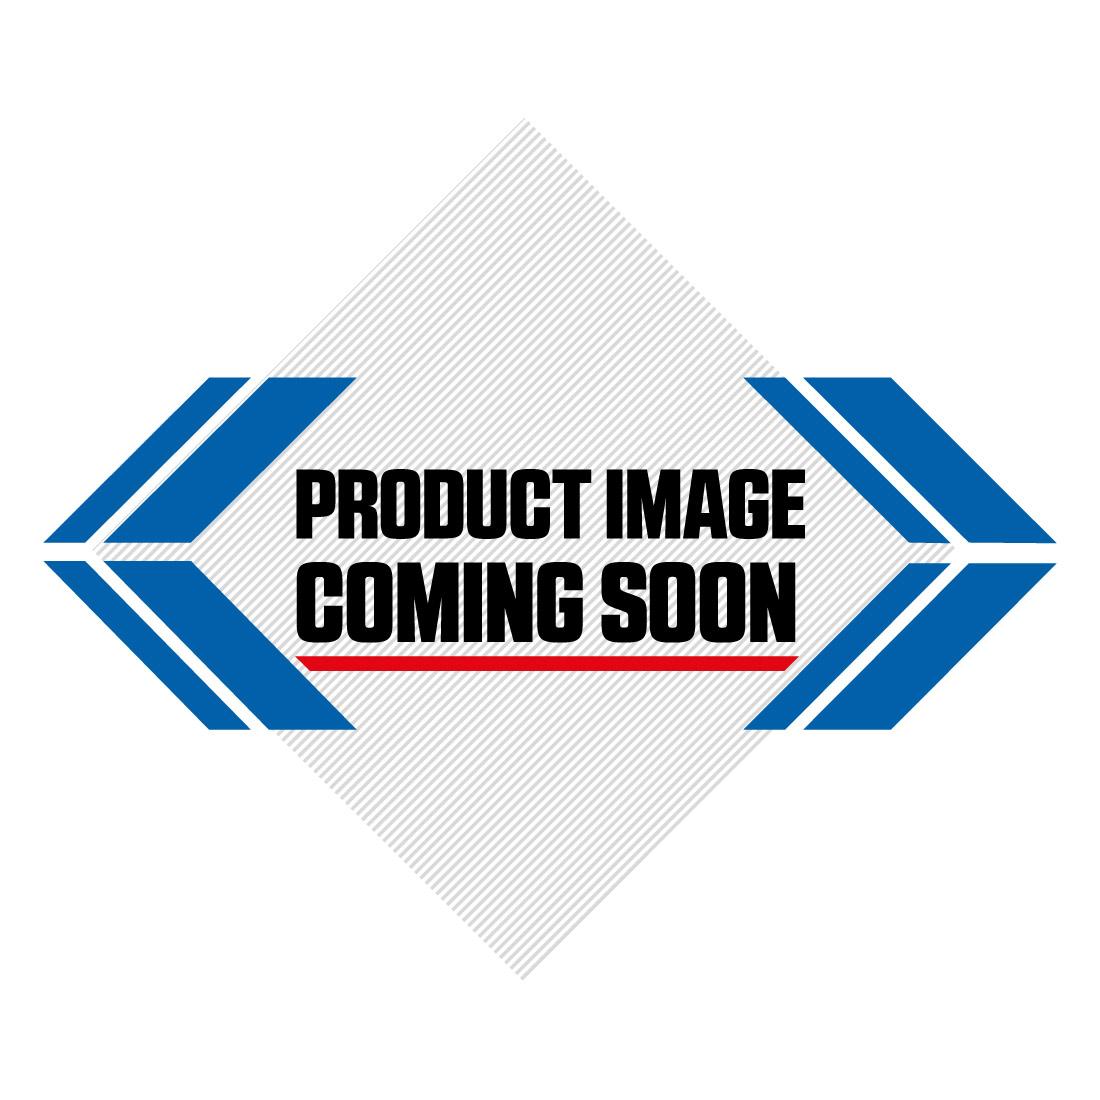 Ufo Plastic Kit In Black Ktm 65 Sx Md Racing Products